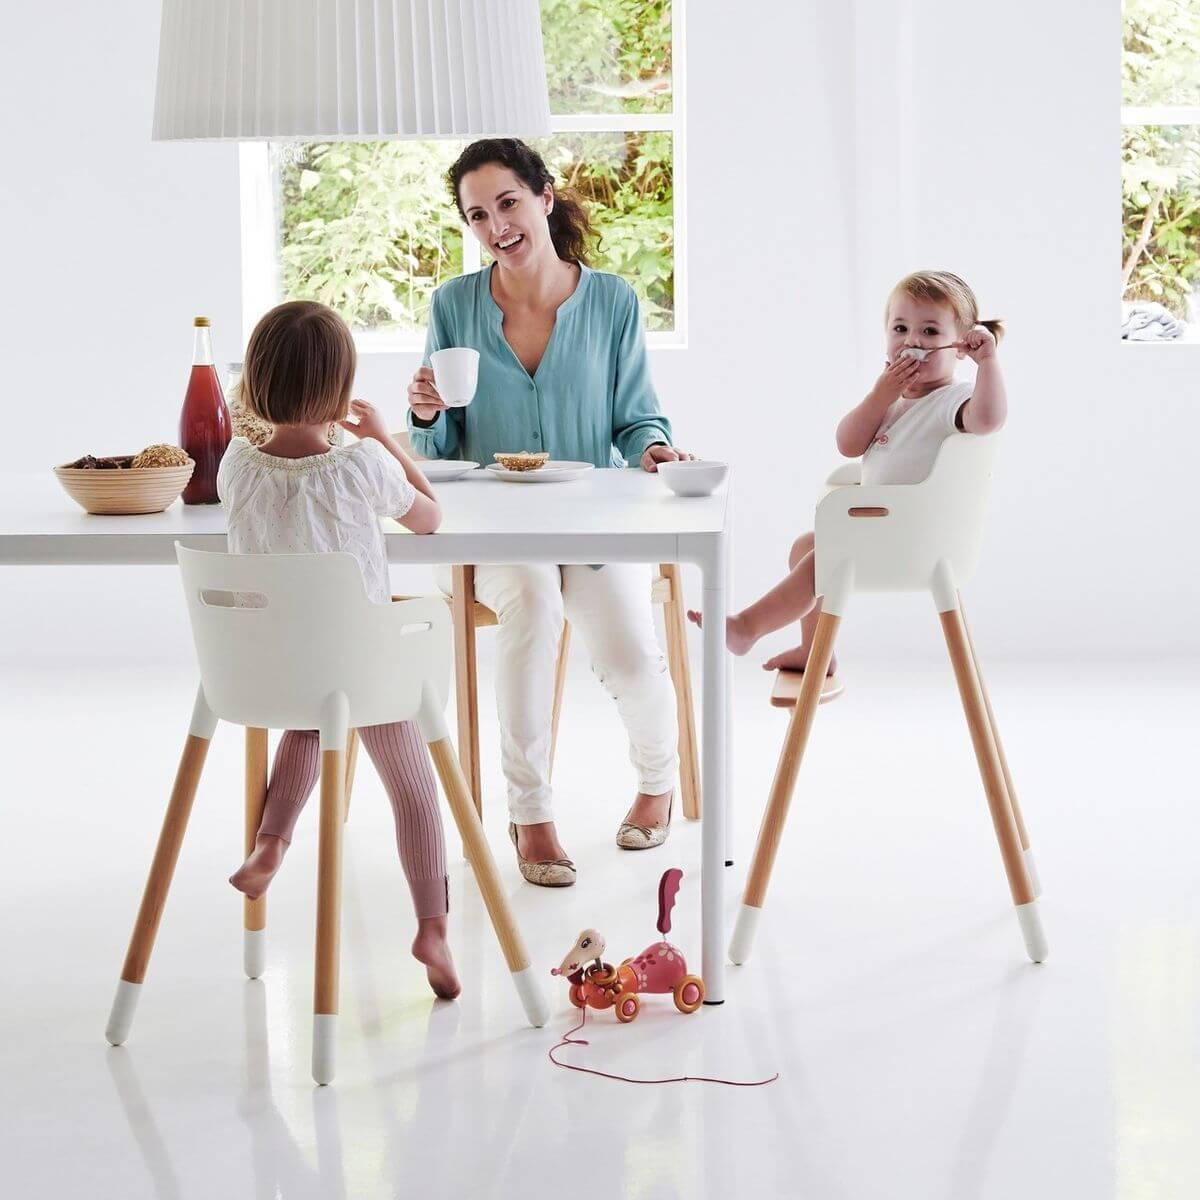 Patas convertir Trona bebé en Silla infantil Flexa blancas